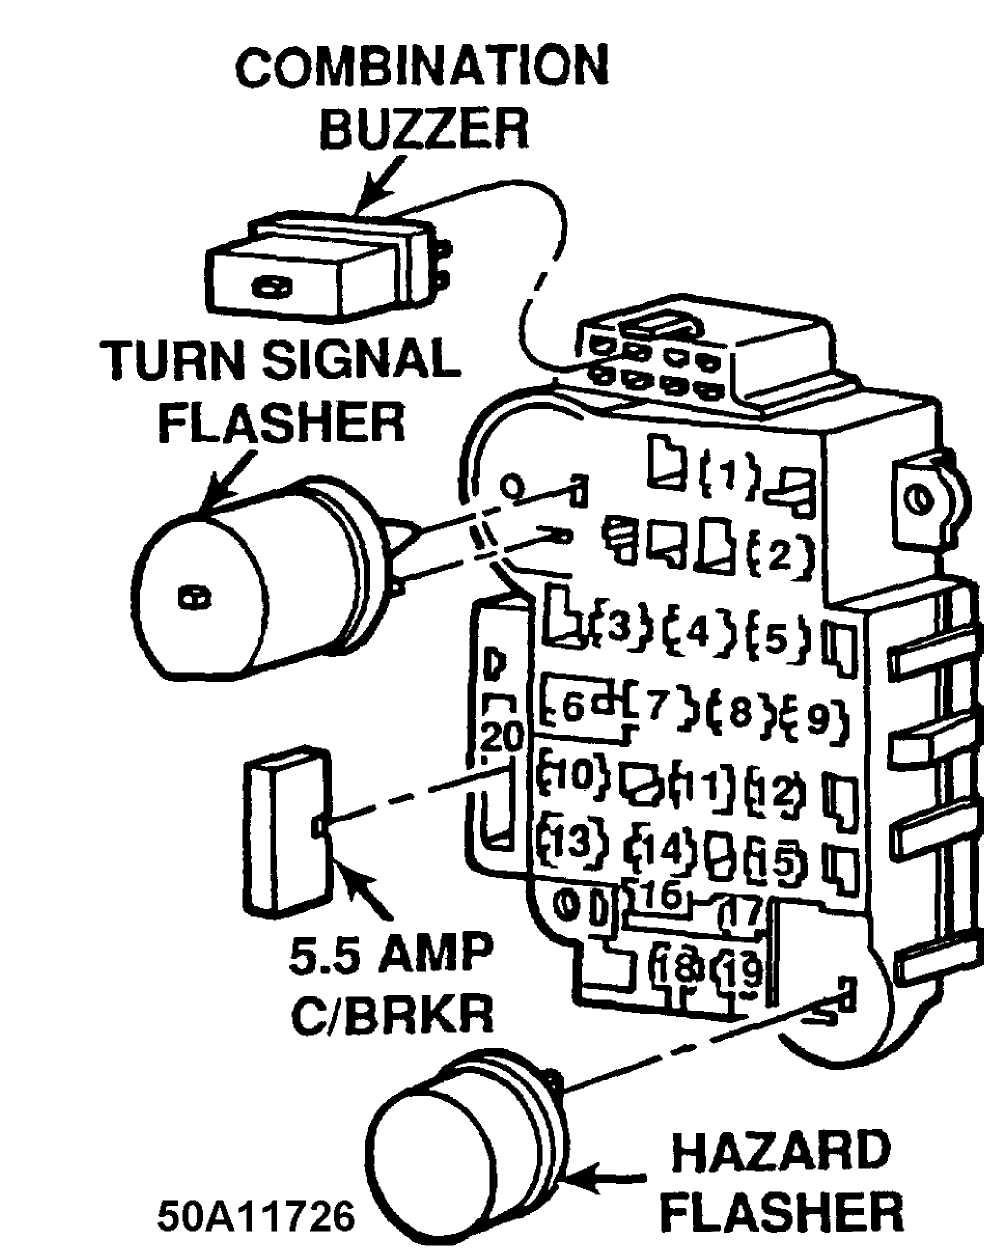 10 fuse panel identification 1992 models courtesy of chrysler corp